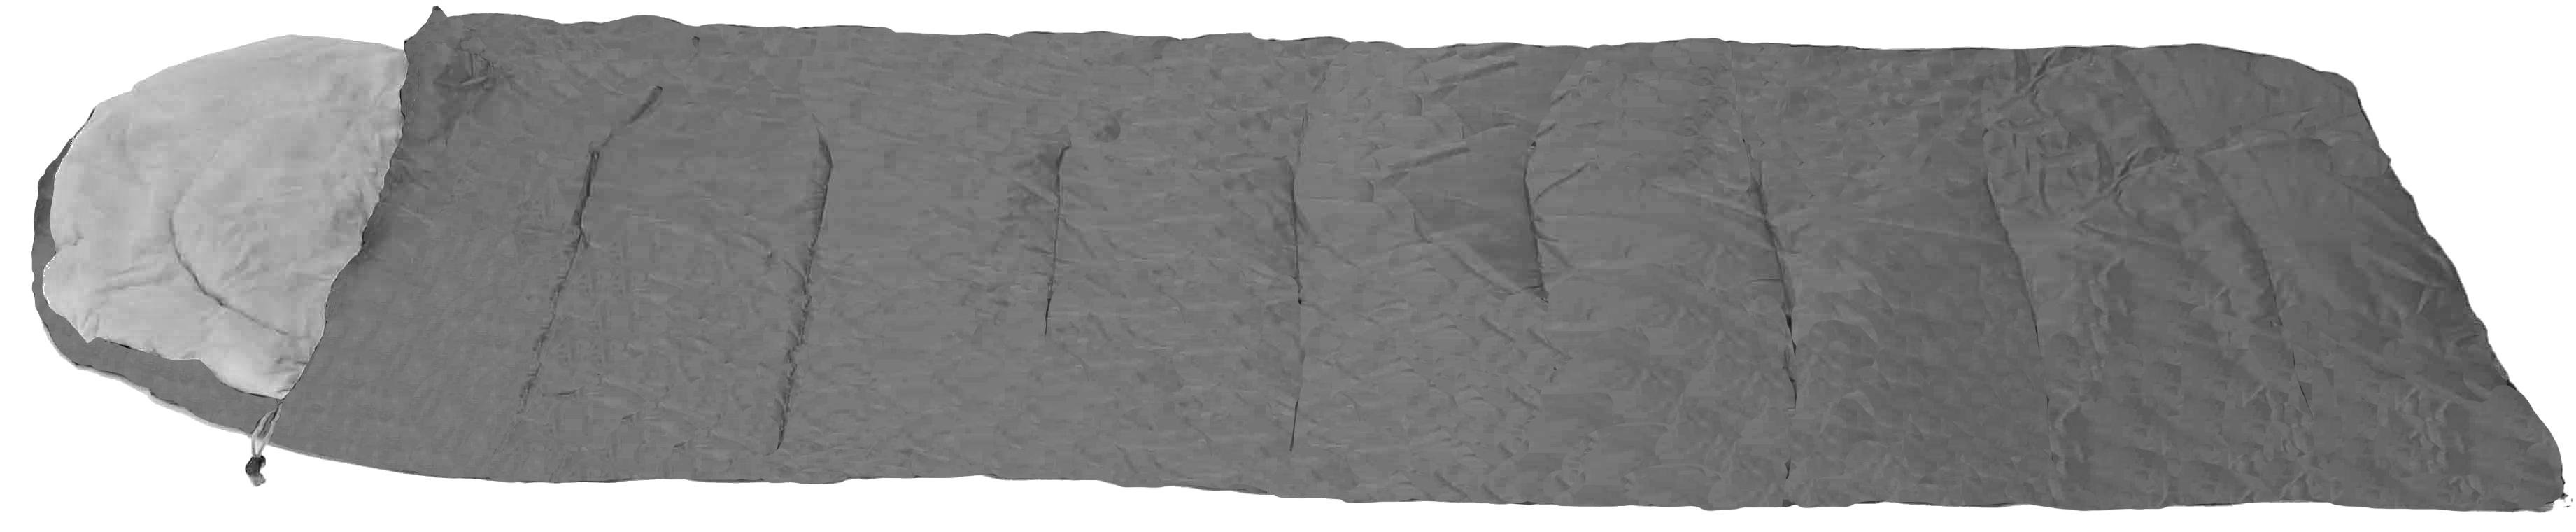 SLEEPING BAG PINATUBO GRAY 220X75cm  WITH PILLOW & CASE